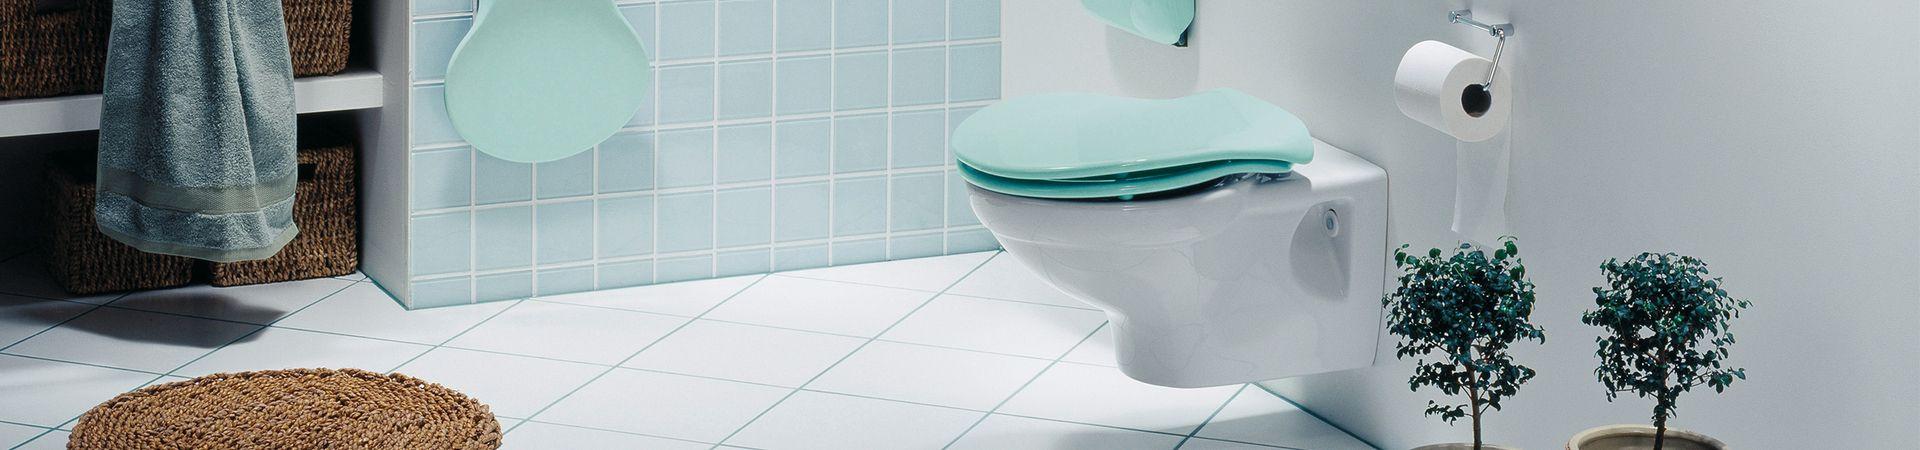 5 weetjes over het toilet - 5 weetjes over het toilet